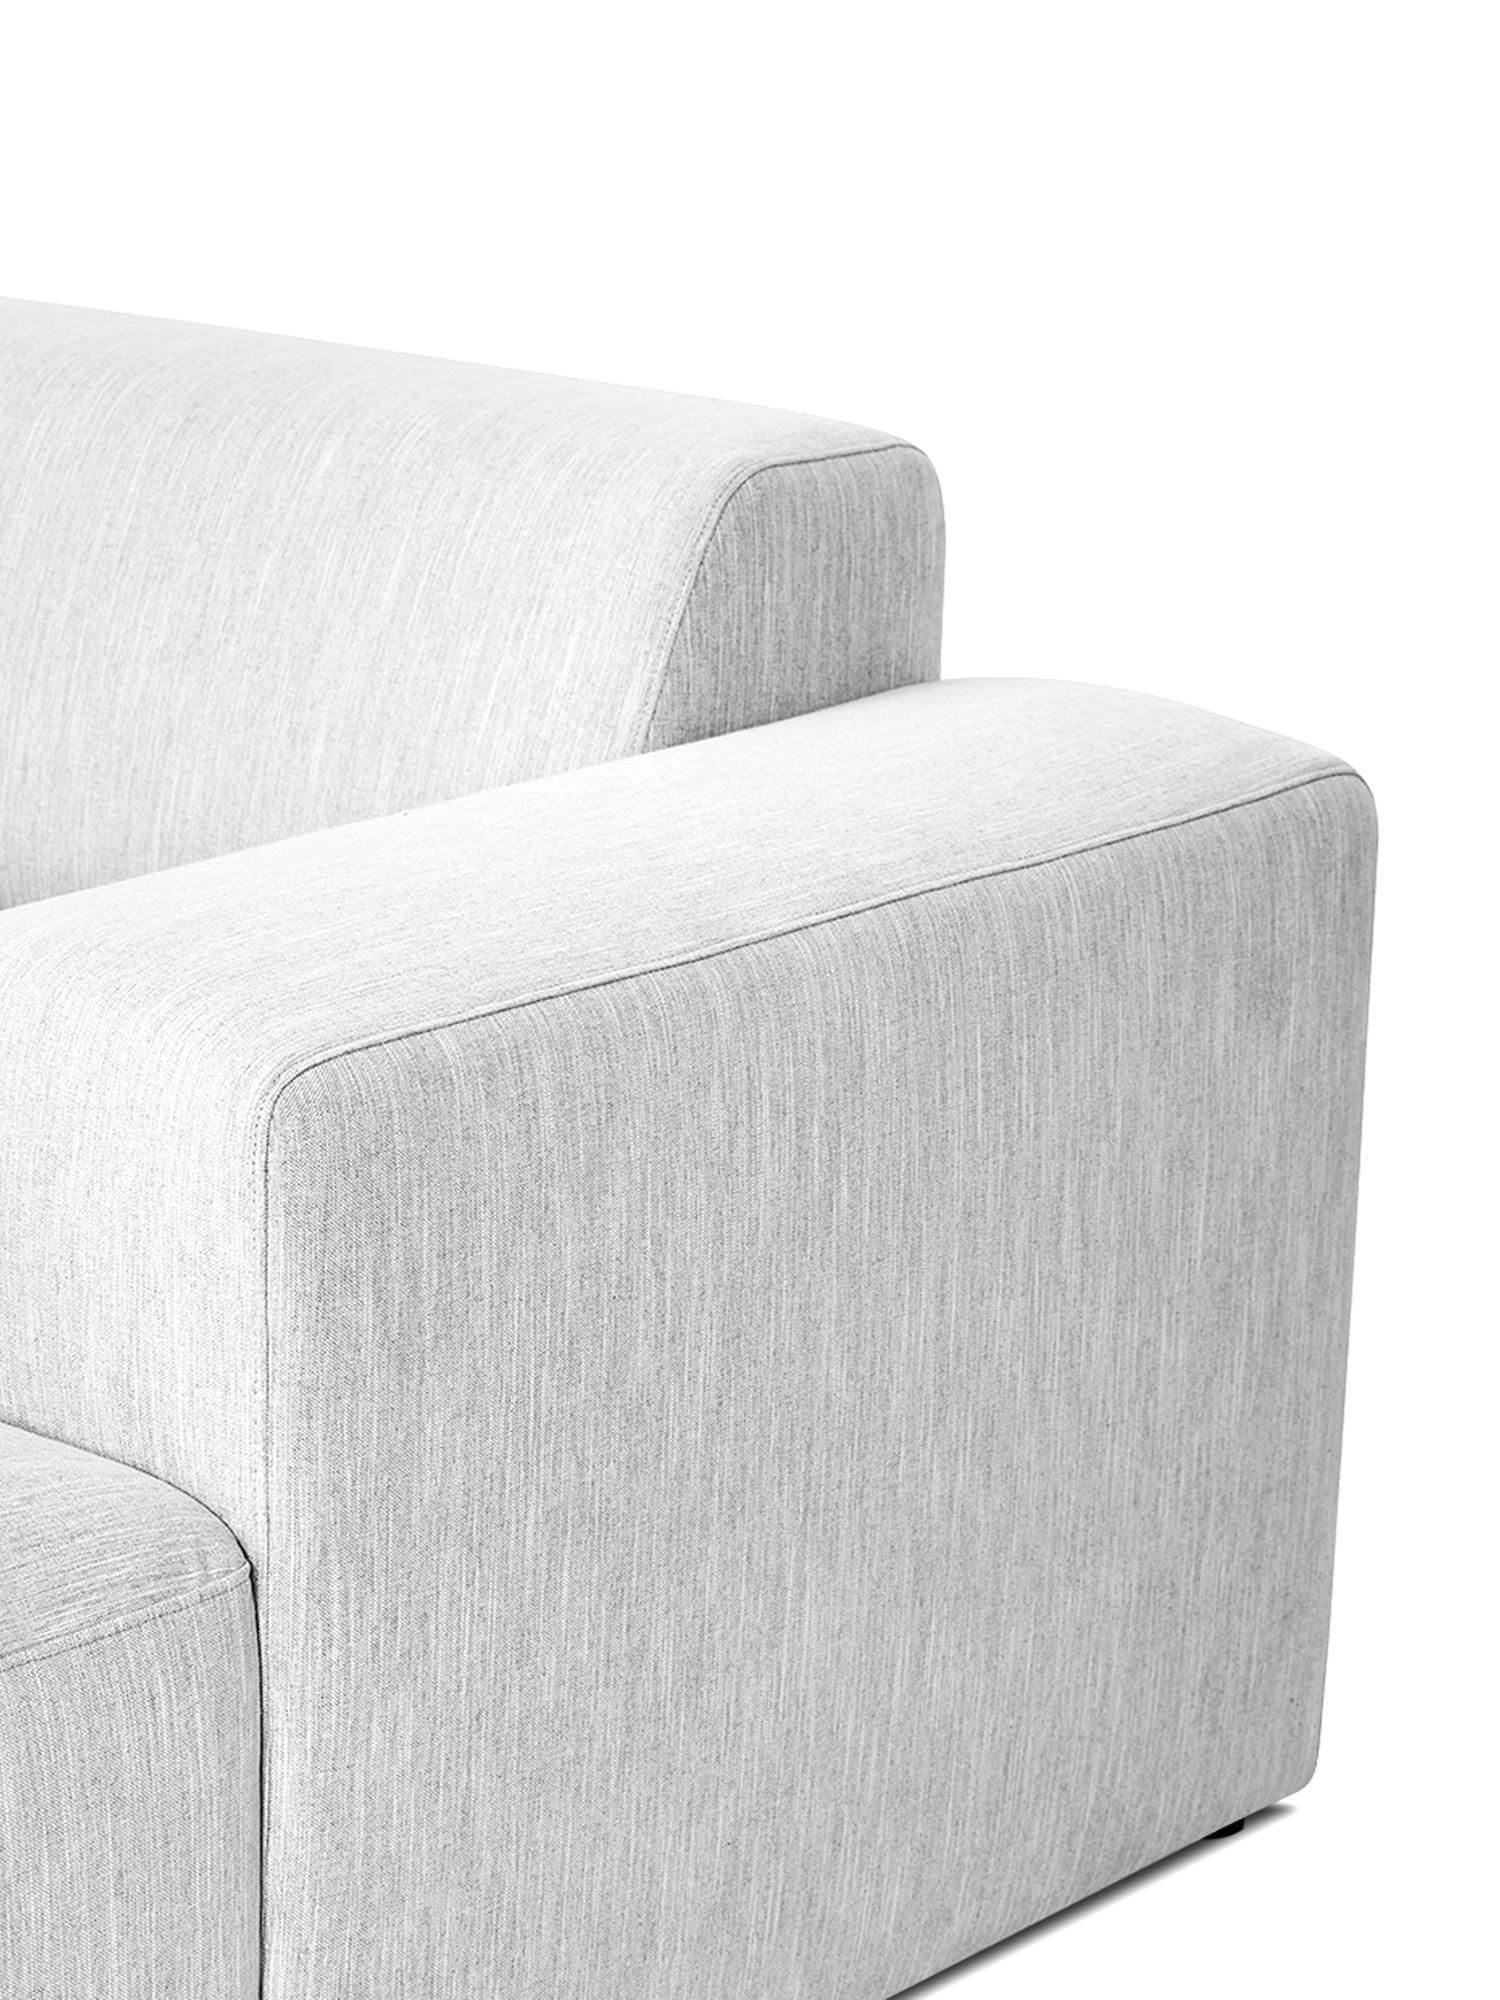 Ecksofa Melva (4-Sitzer), Bezug: Polyester Der hochwertige, Gestell: Massives Kiefernholz, Spa, Füße: Kiefernholz, Webstoff Hellgrau, B 319 x T 144 cm